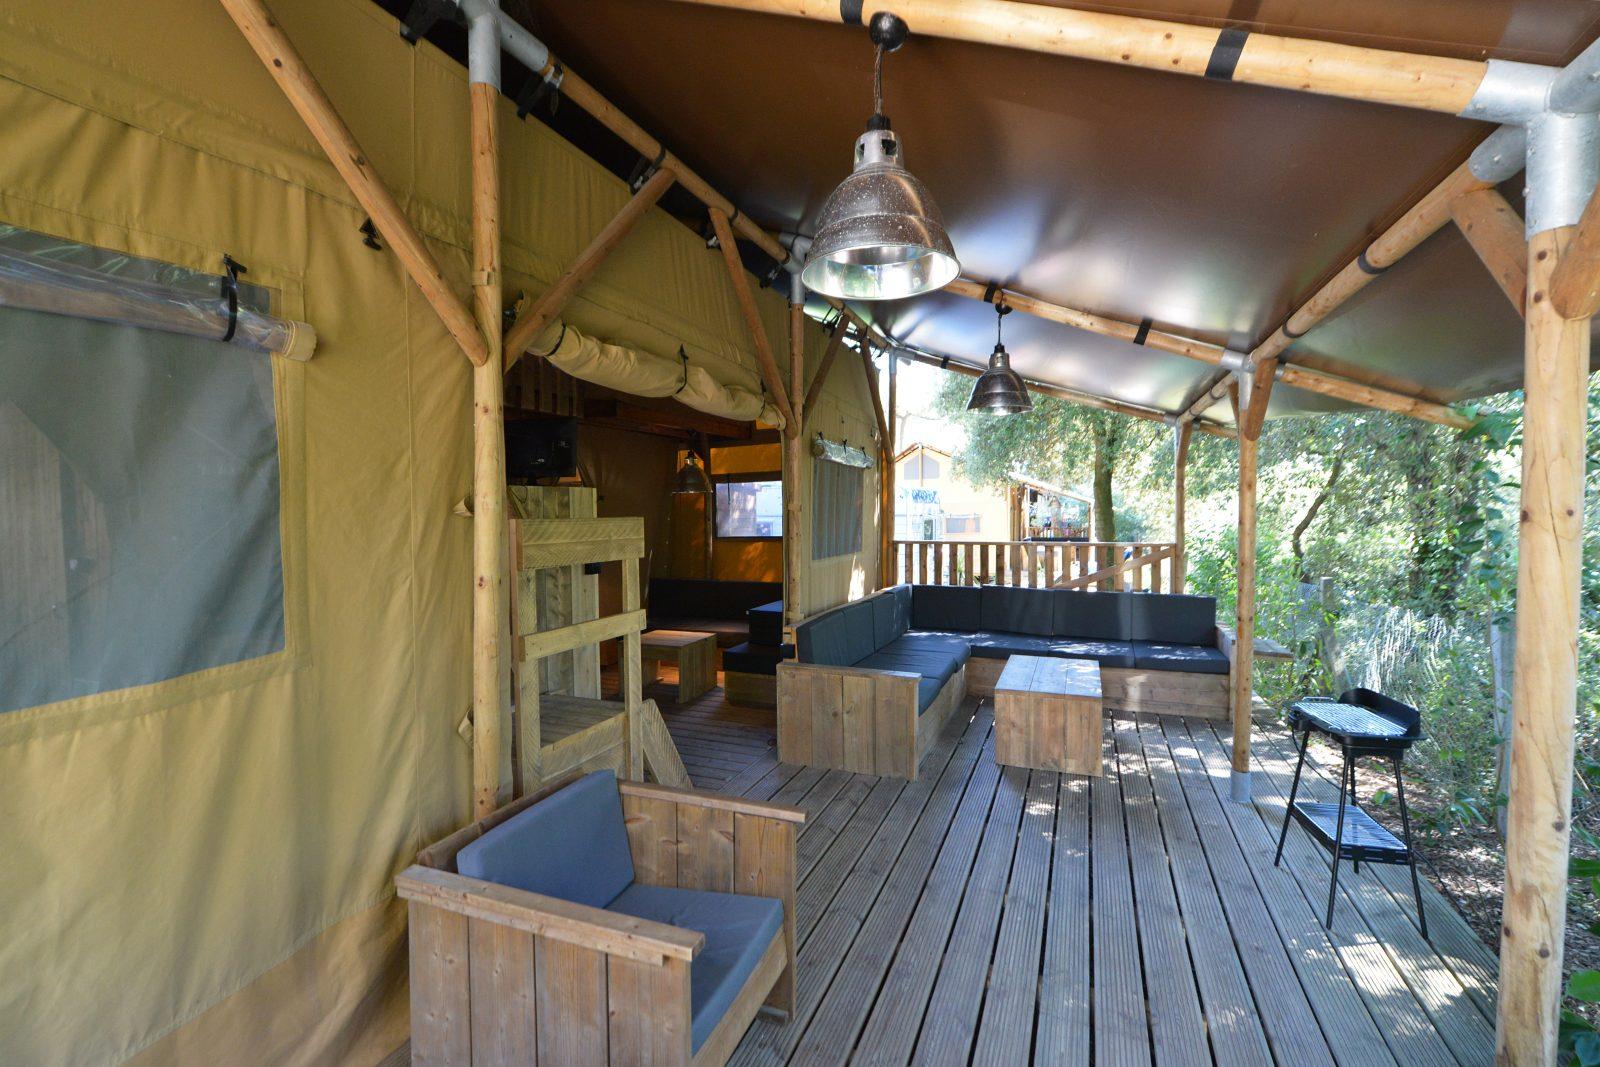 Camping_Les_Pins_44_HD_©X.Renaudin_DSC_6058